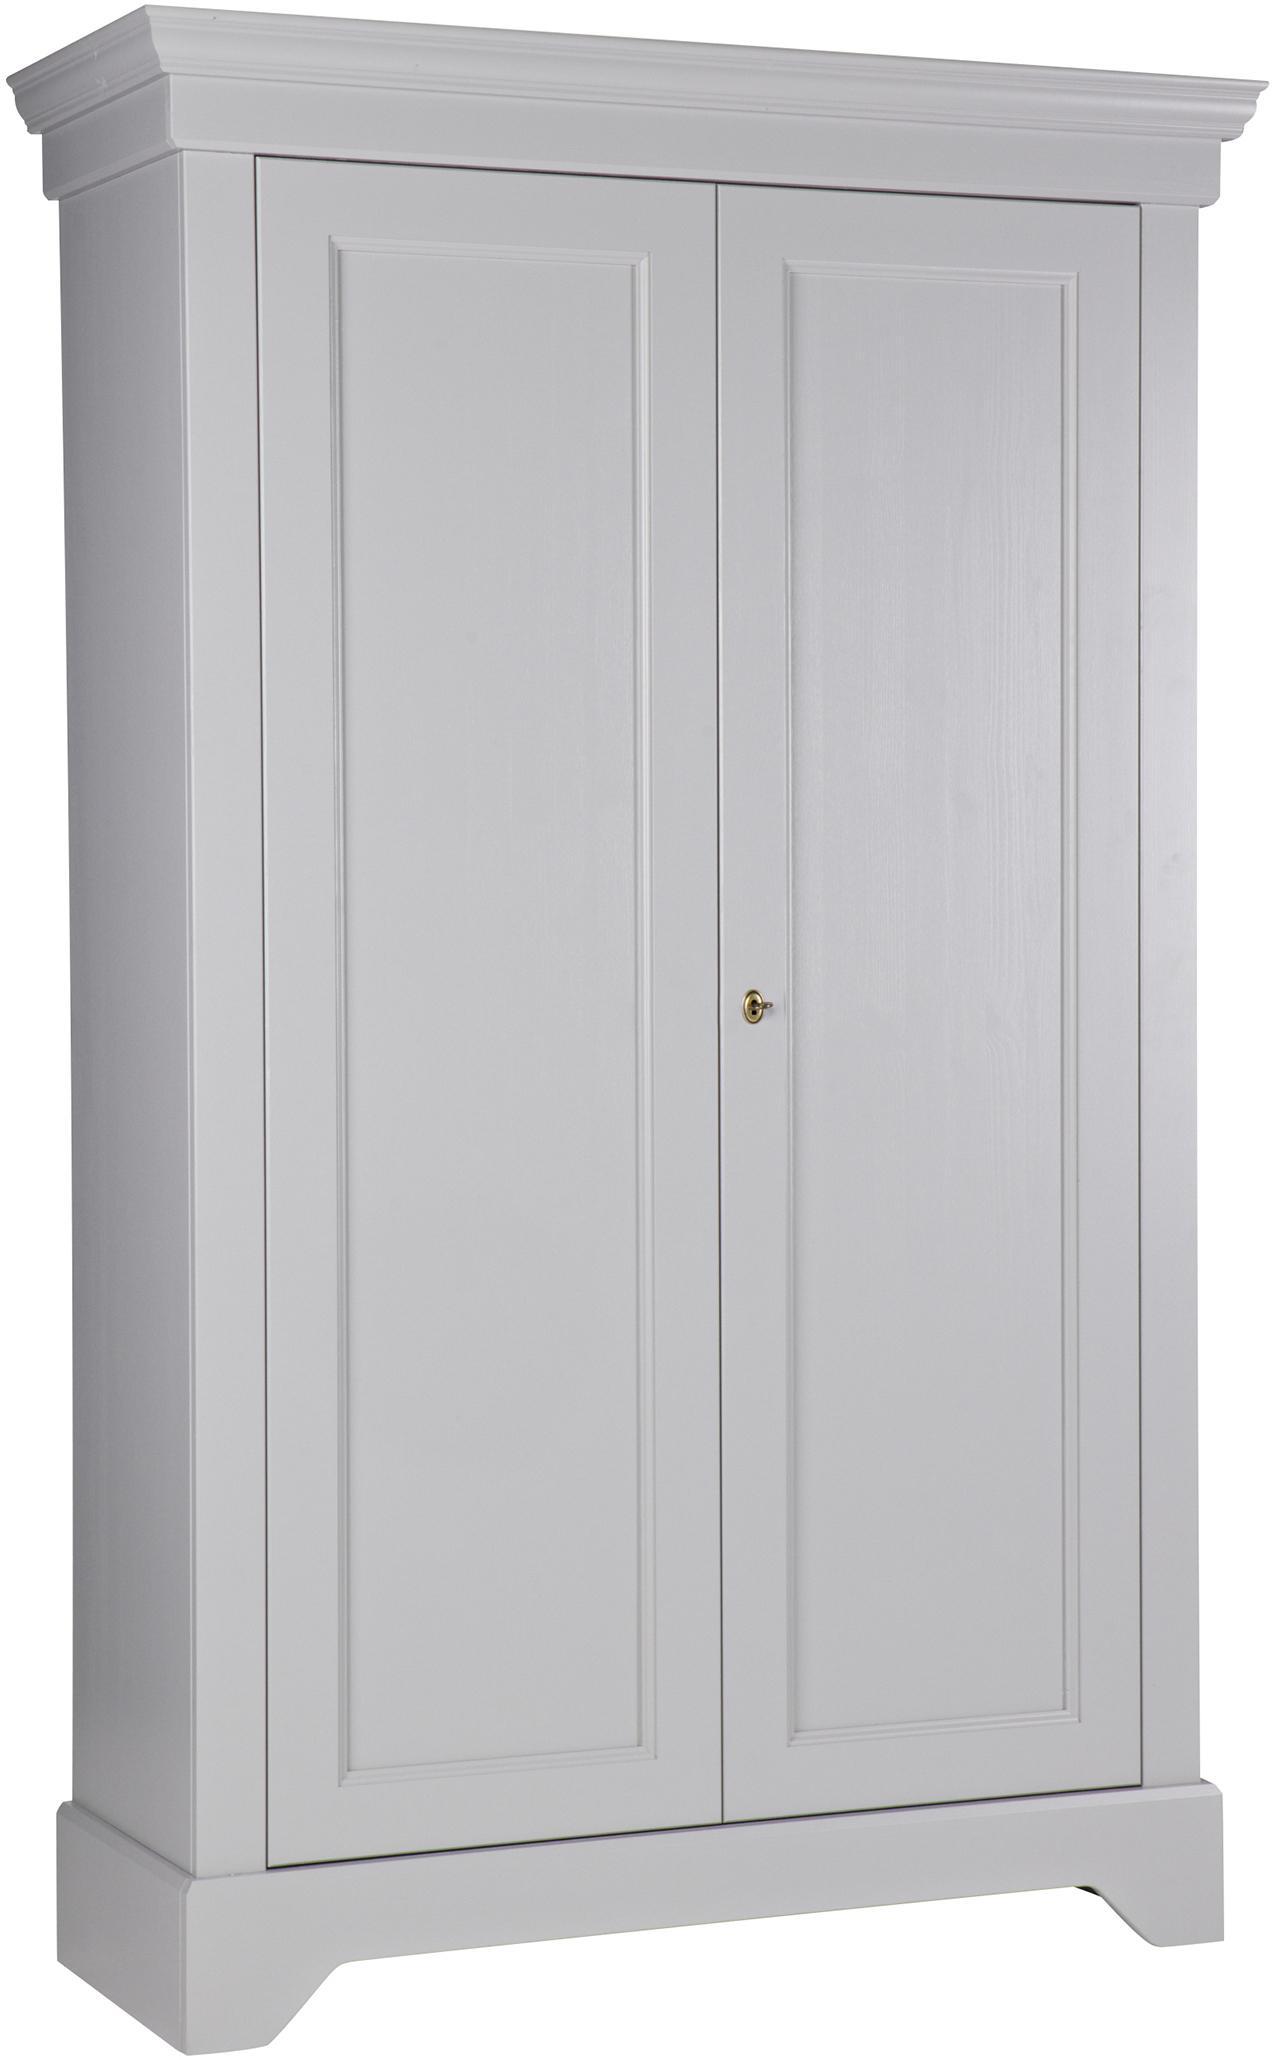 Schrank Isabel aus Kiefernholz, Korpus: Kiefernholz, lackiert, Betongrau, 118 x 191 cm